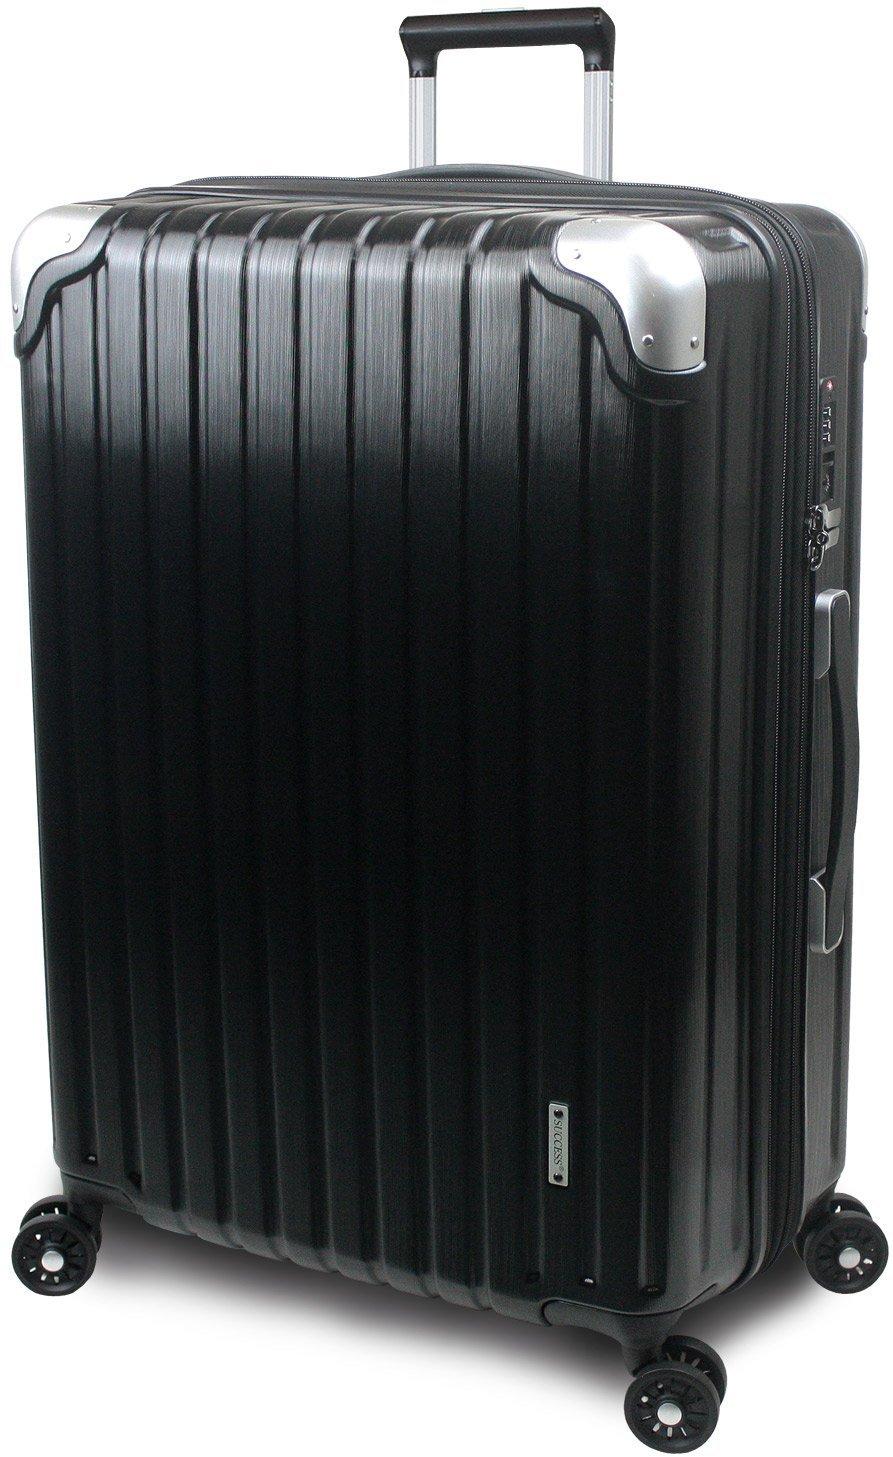 【SUCCESS サクセス】 スーツケース 3サイズ 【 大型 76cm/ジャスト型 70cm/中型 65cm 】 超軽量 TSAロック搭載 【 プロデンス コーナーパットモデル】 B01ELOM3CS ジャスト型 Jサイズ 70cm|ブラックヘアライン ブラックヘアライン ジャスト型 Jサイズ 70cm